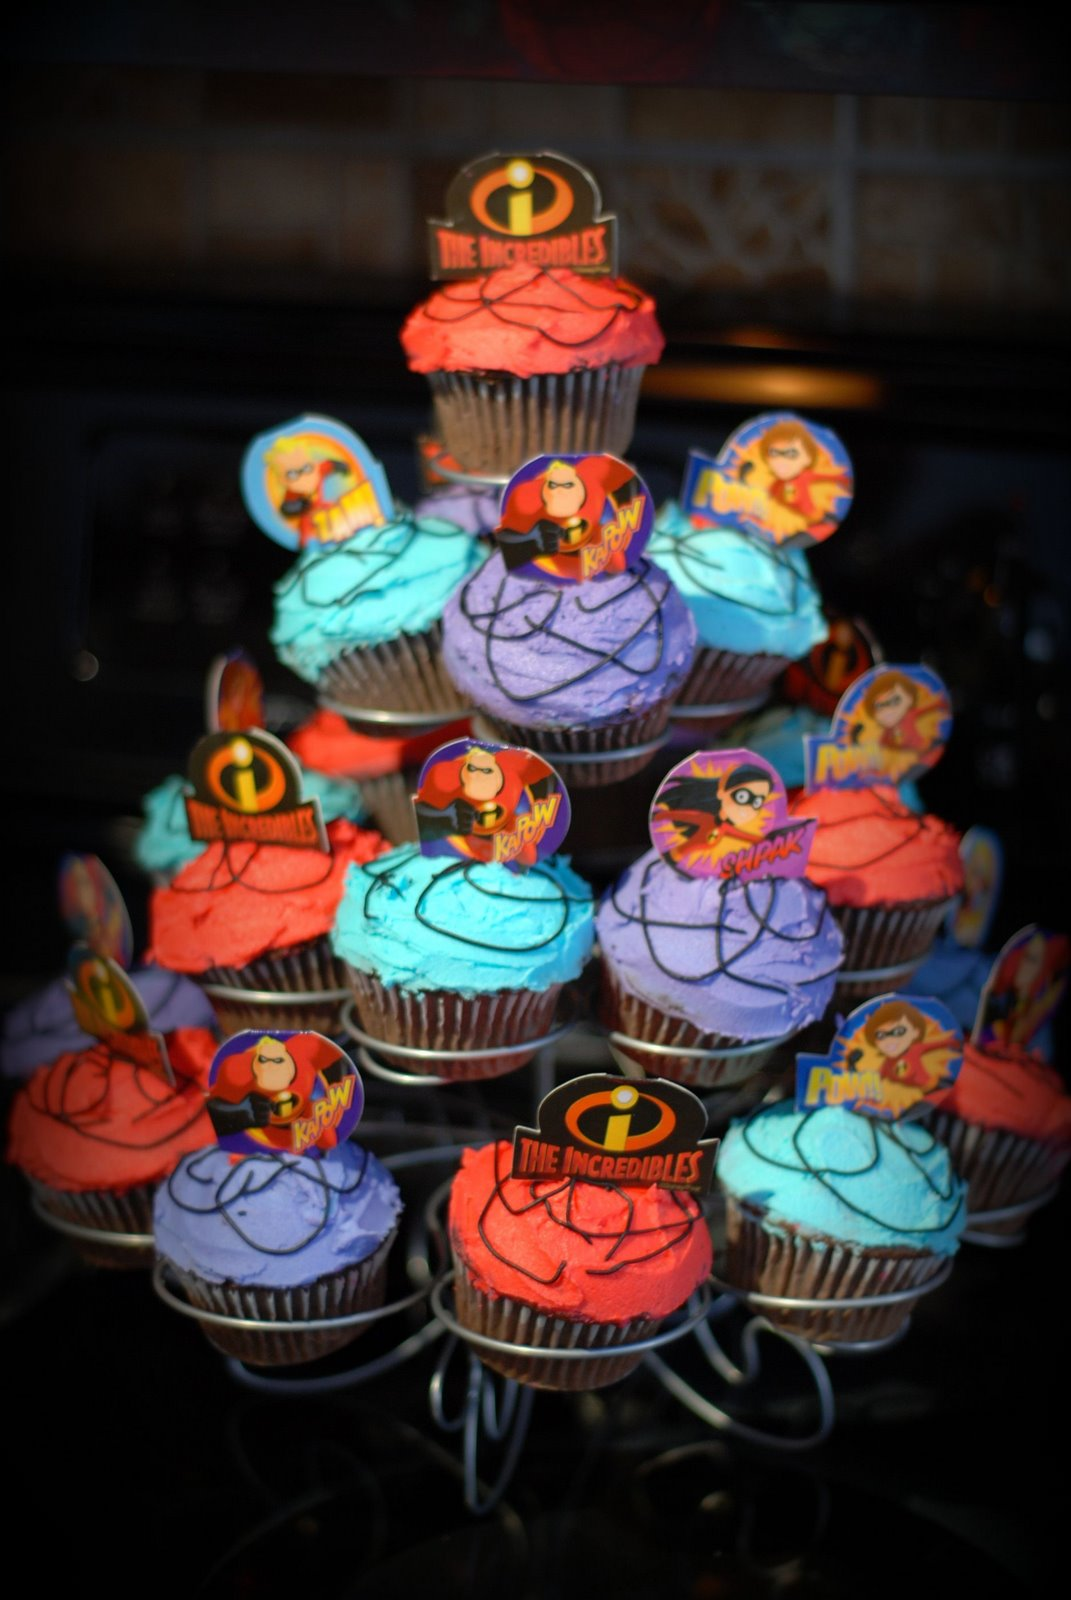 [cupcakes.jpg]